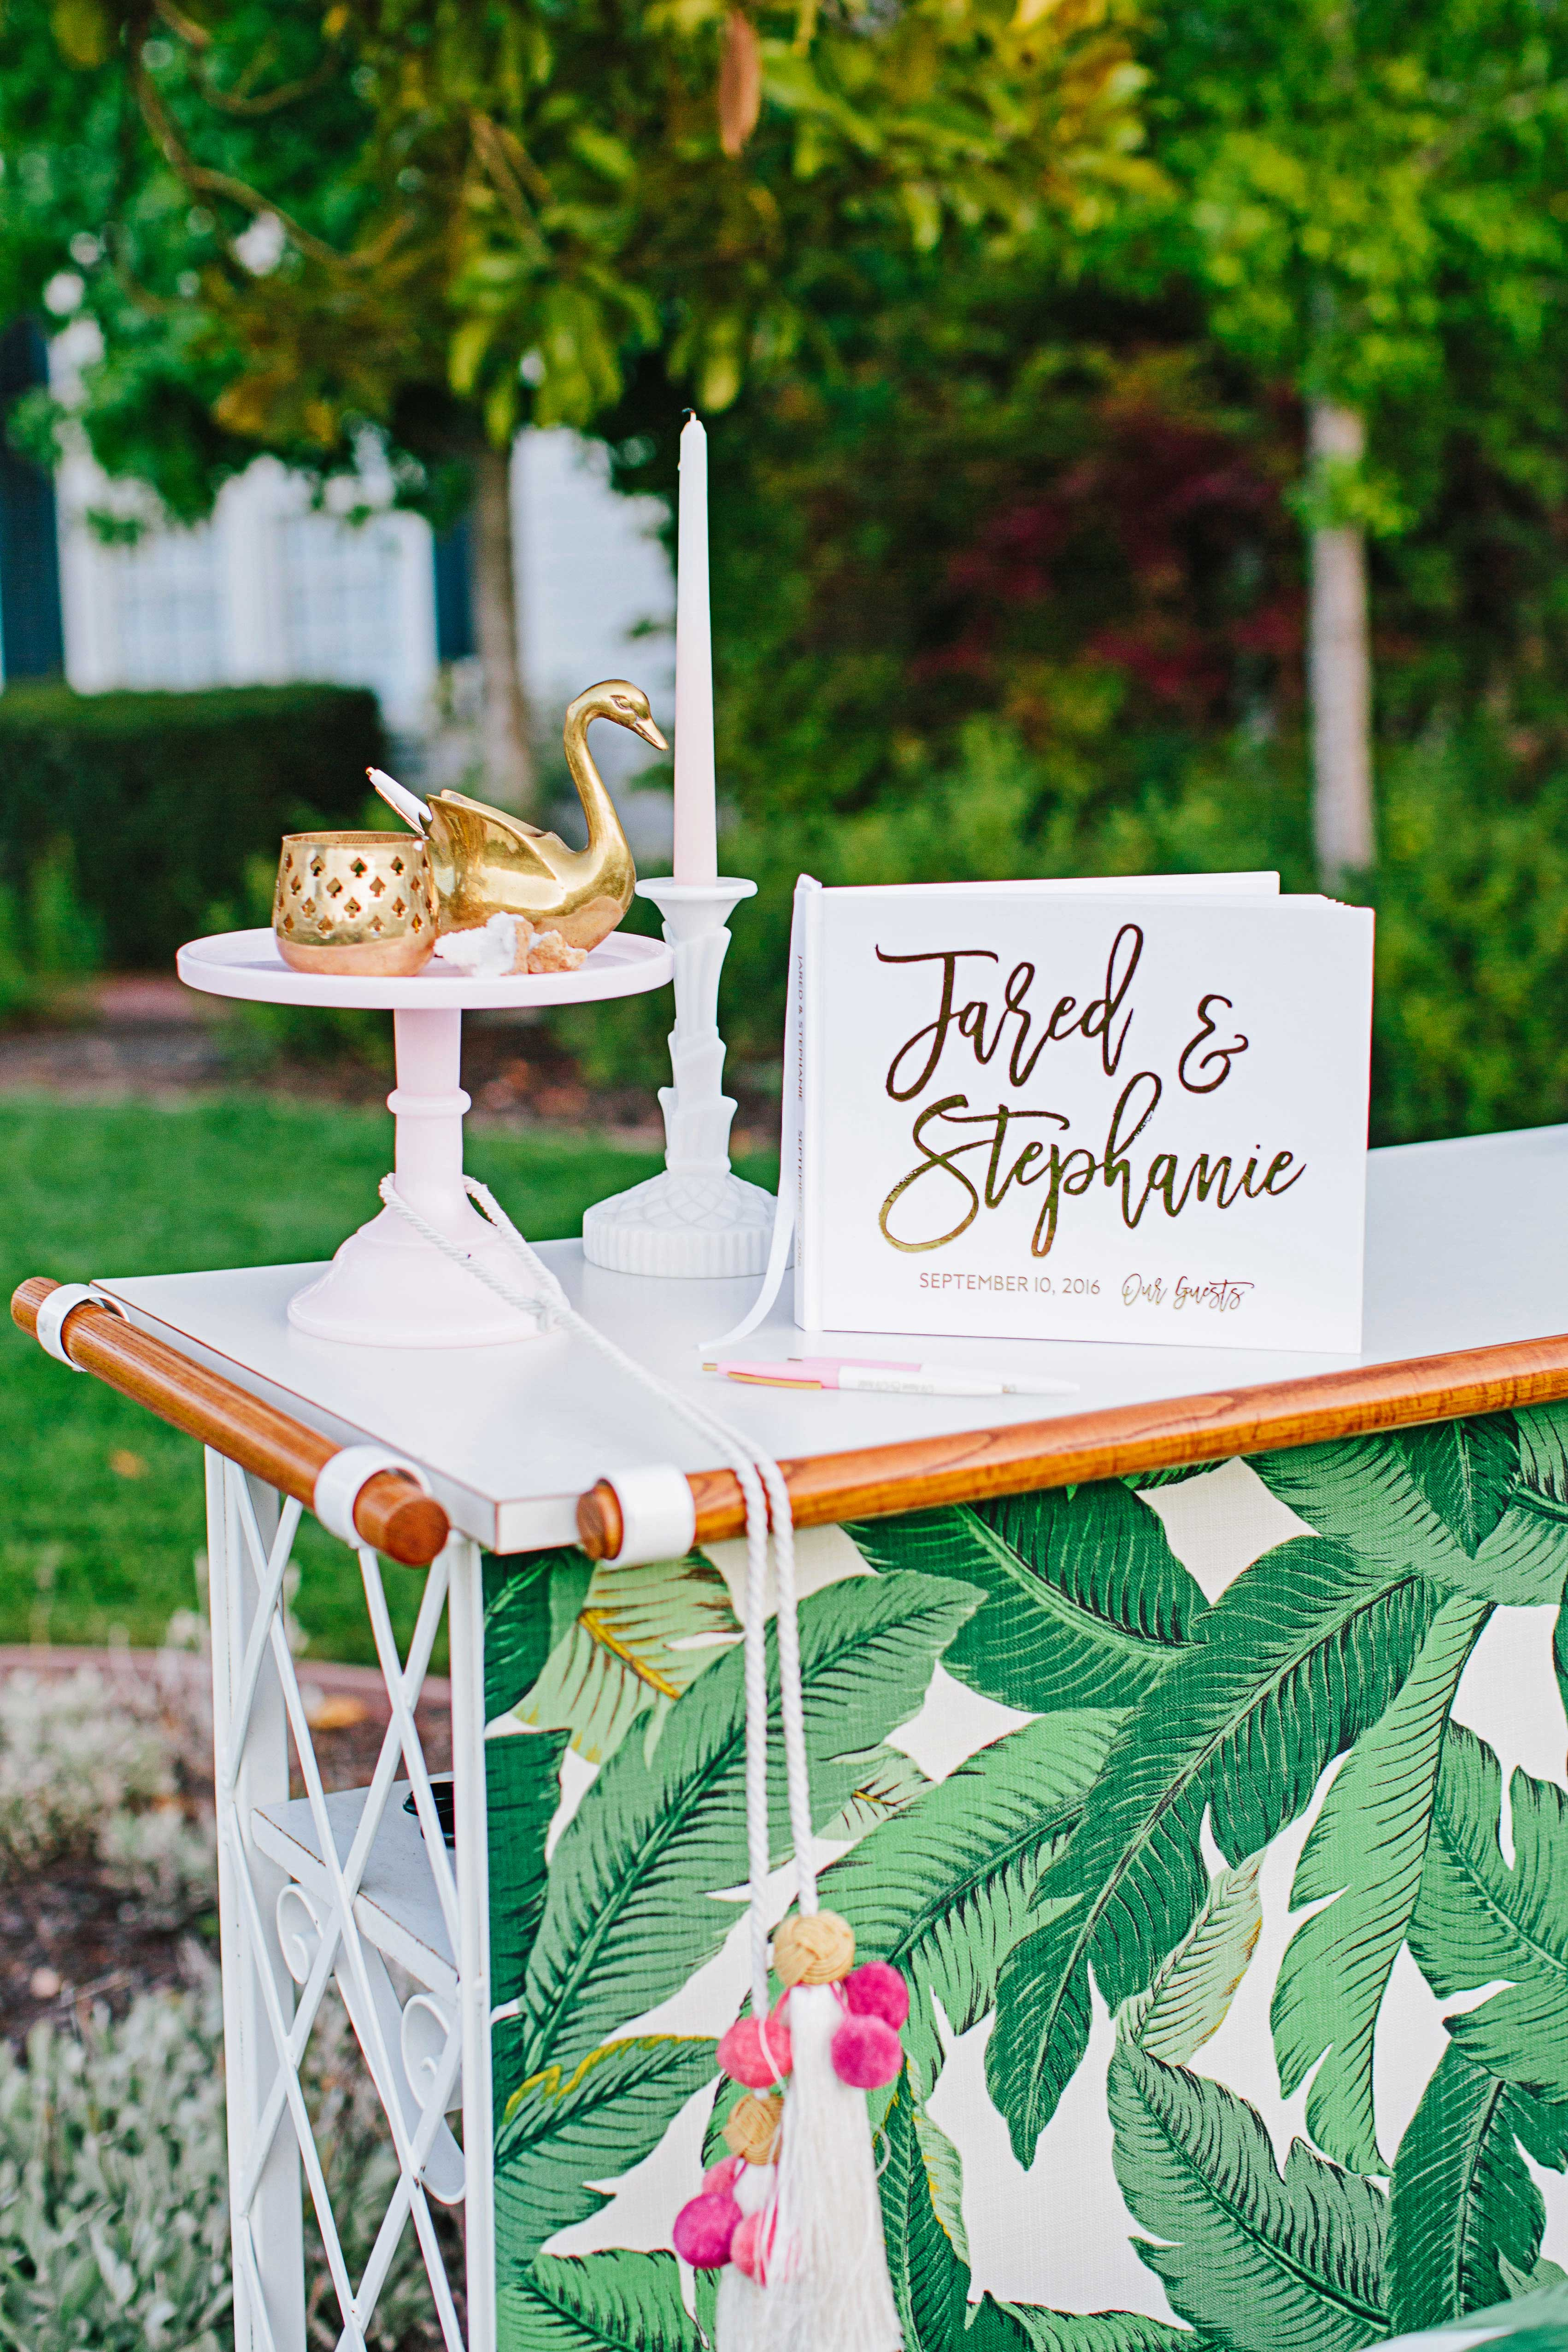 stephanie jared wedding guest book